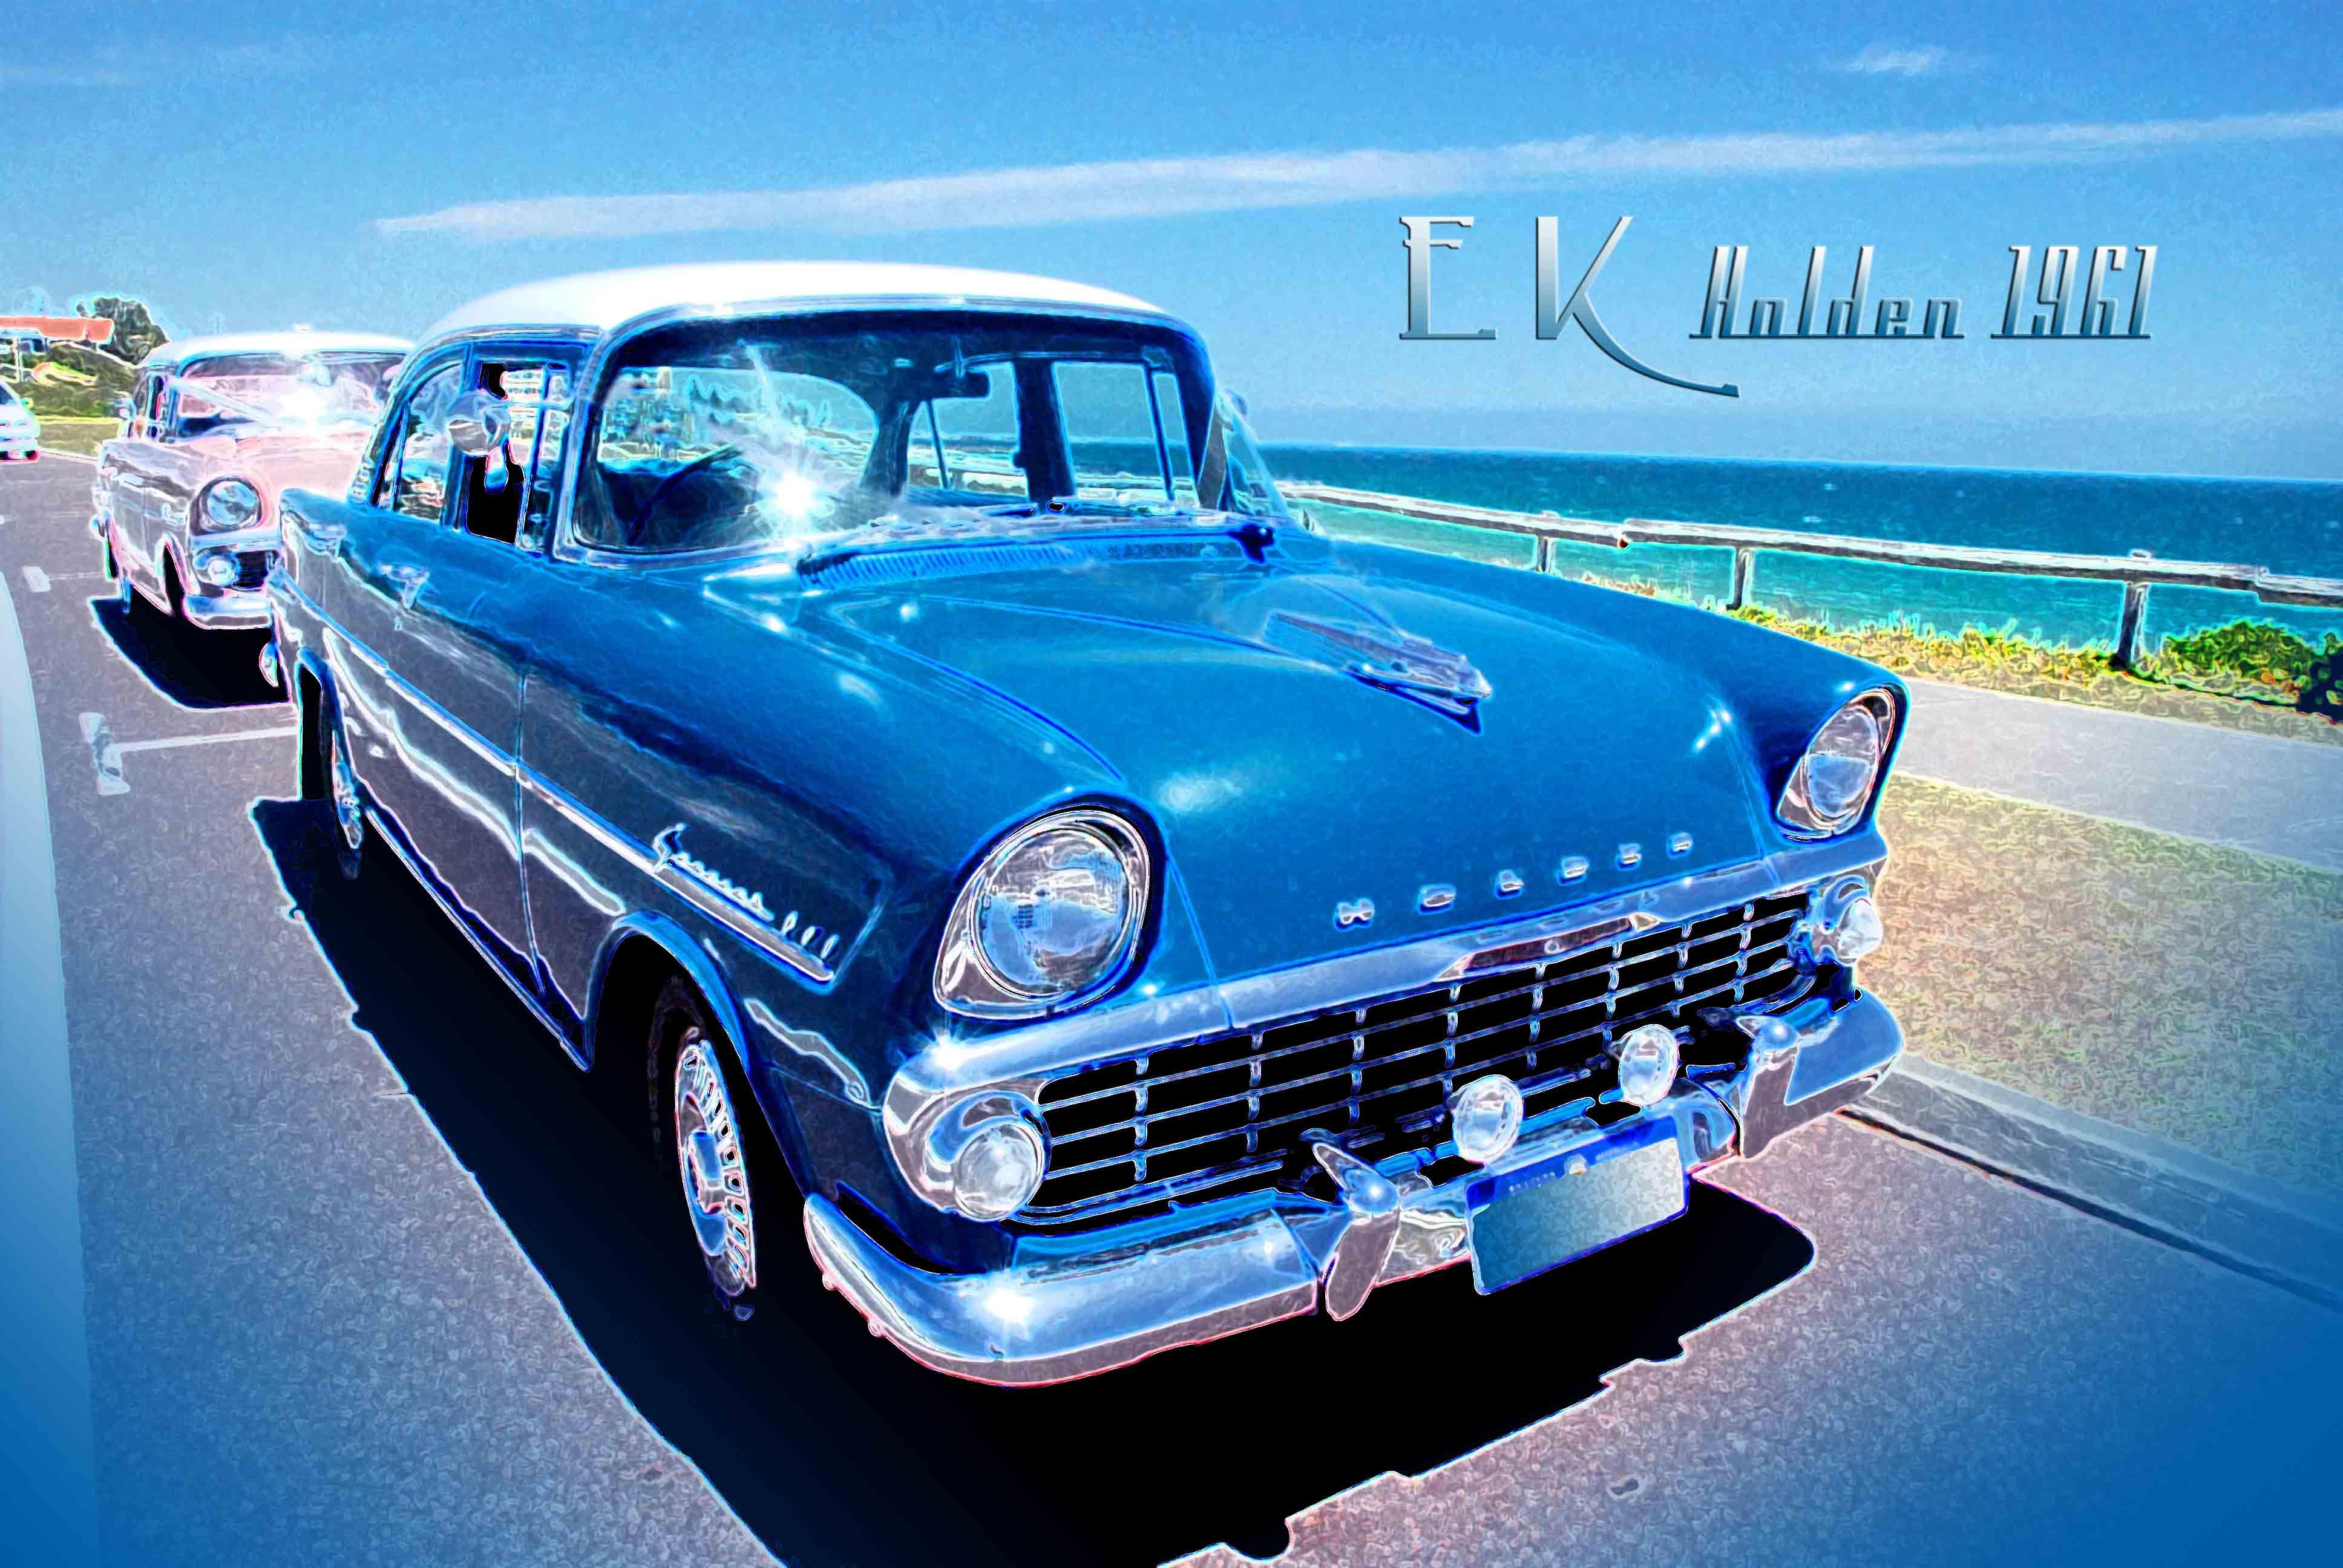 Vintage car Old Holden 1961 EK vintage retro car at the beach ...